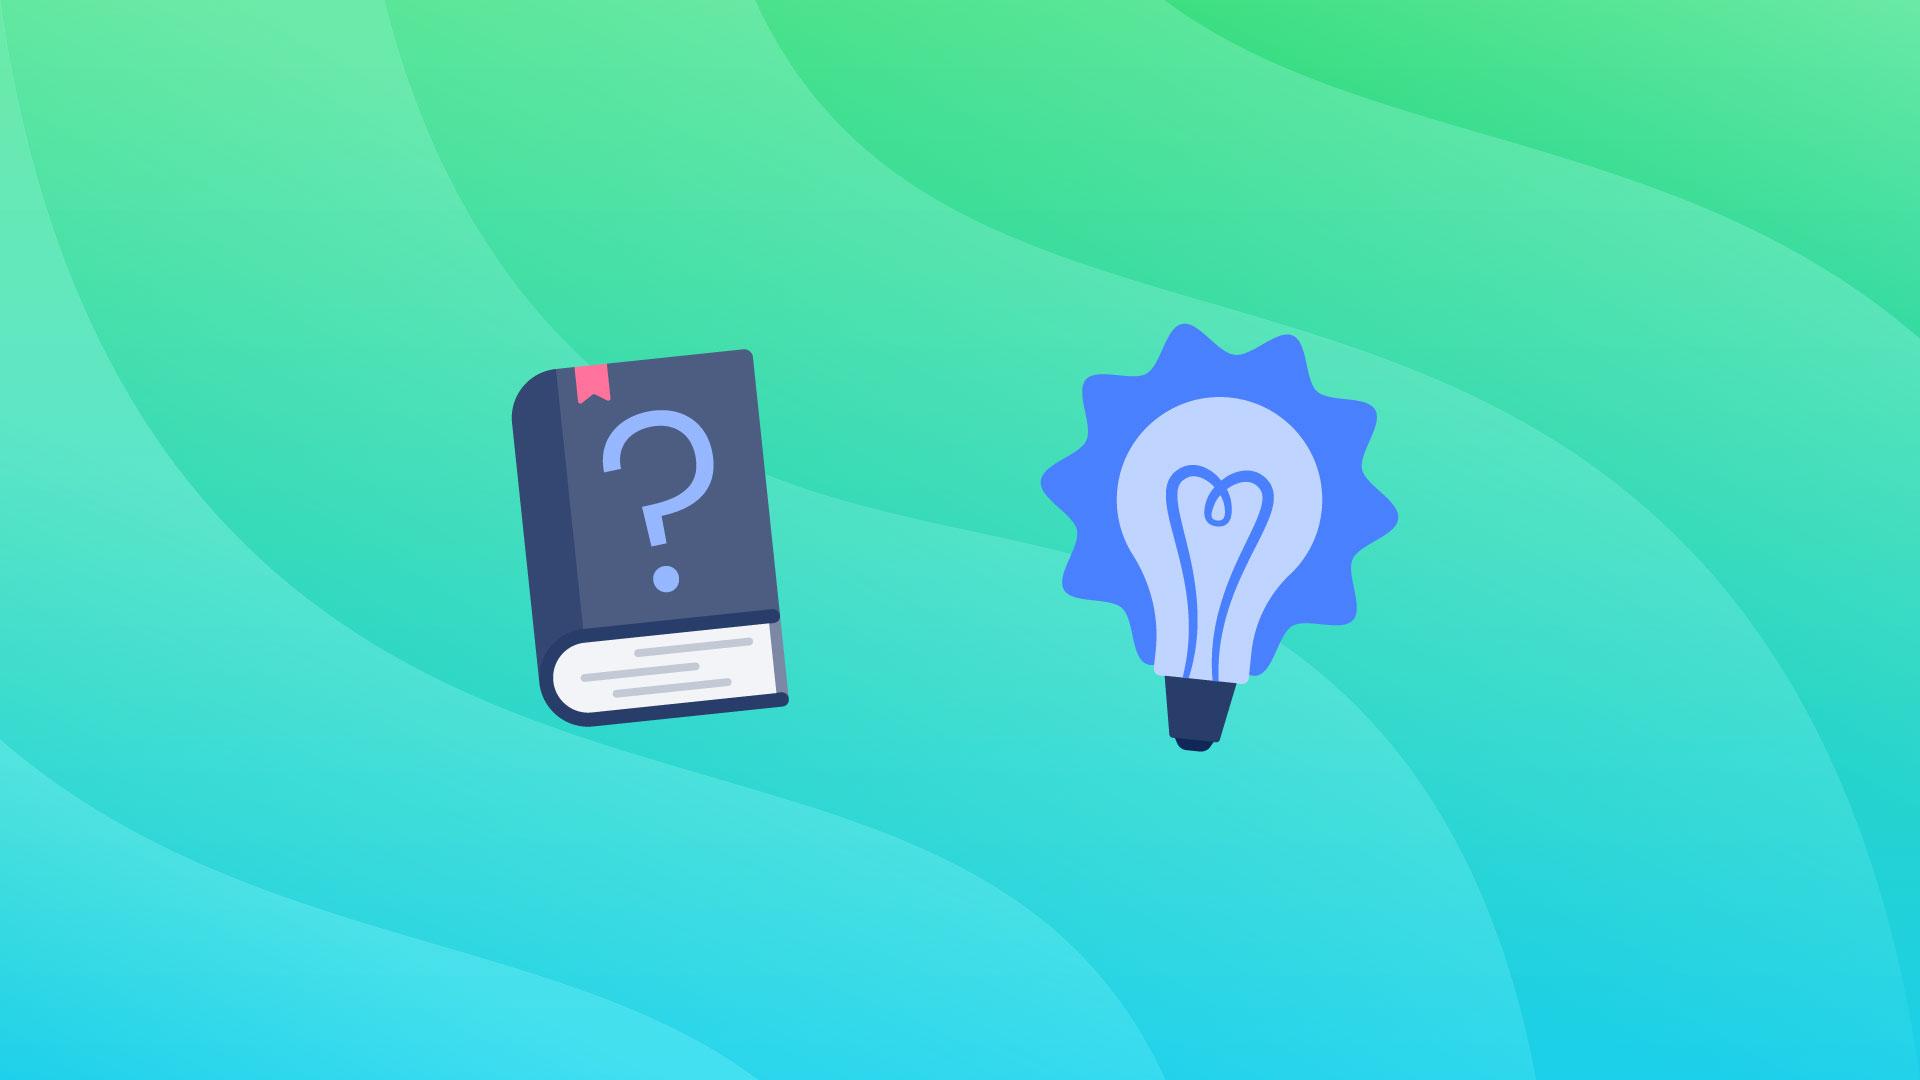 marketing ideas consumer electronics examples